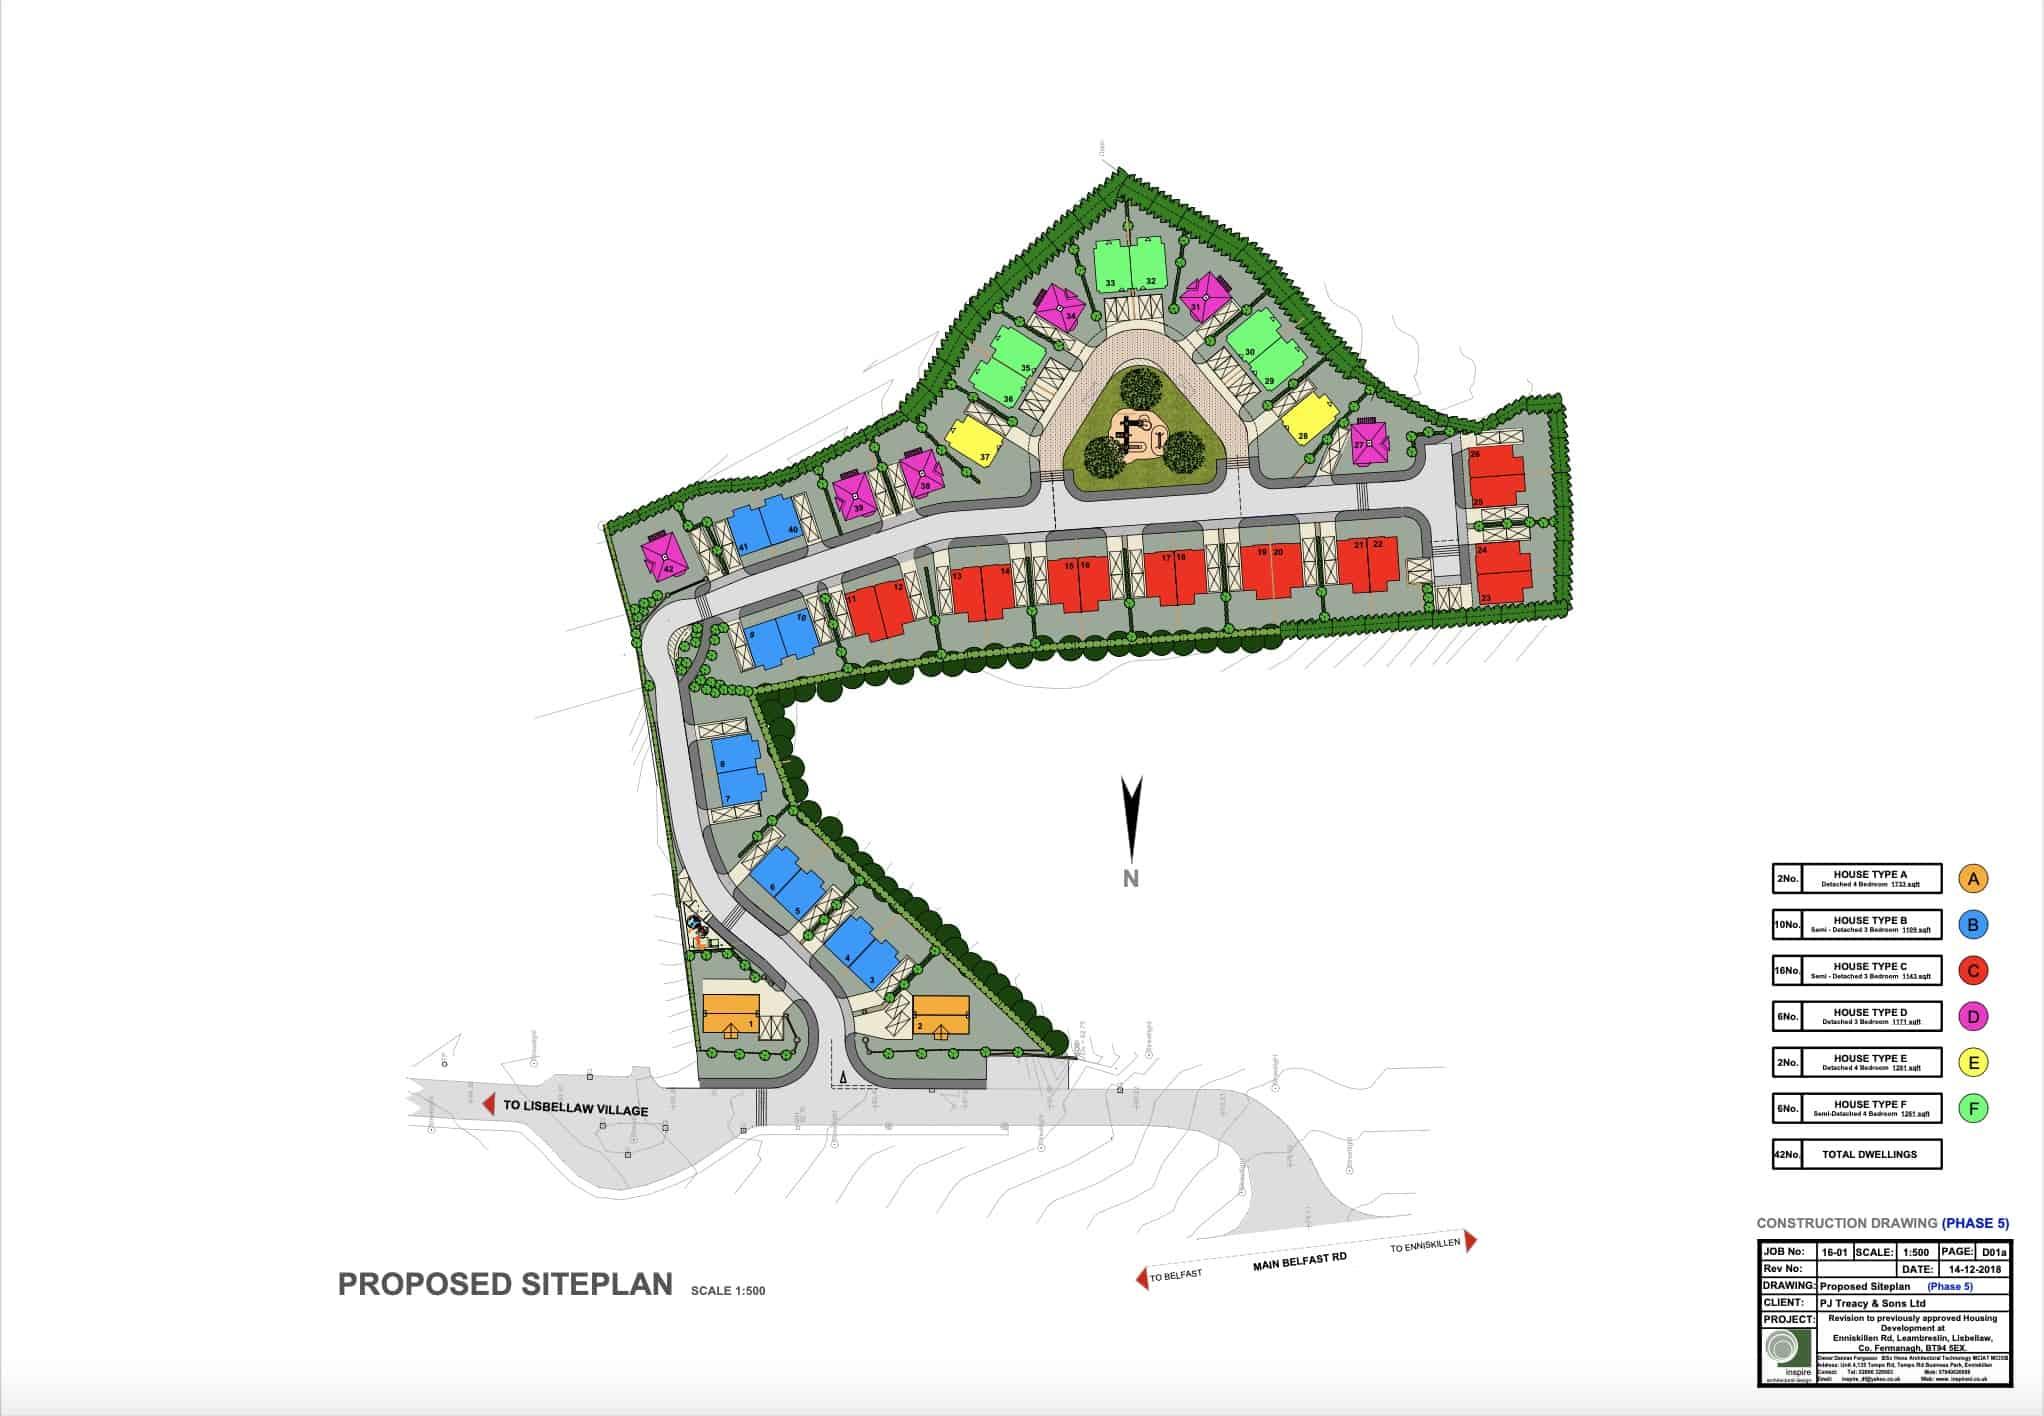 Bluebell Glade Proposed Siteplan